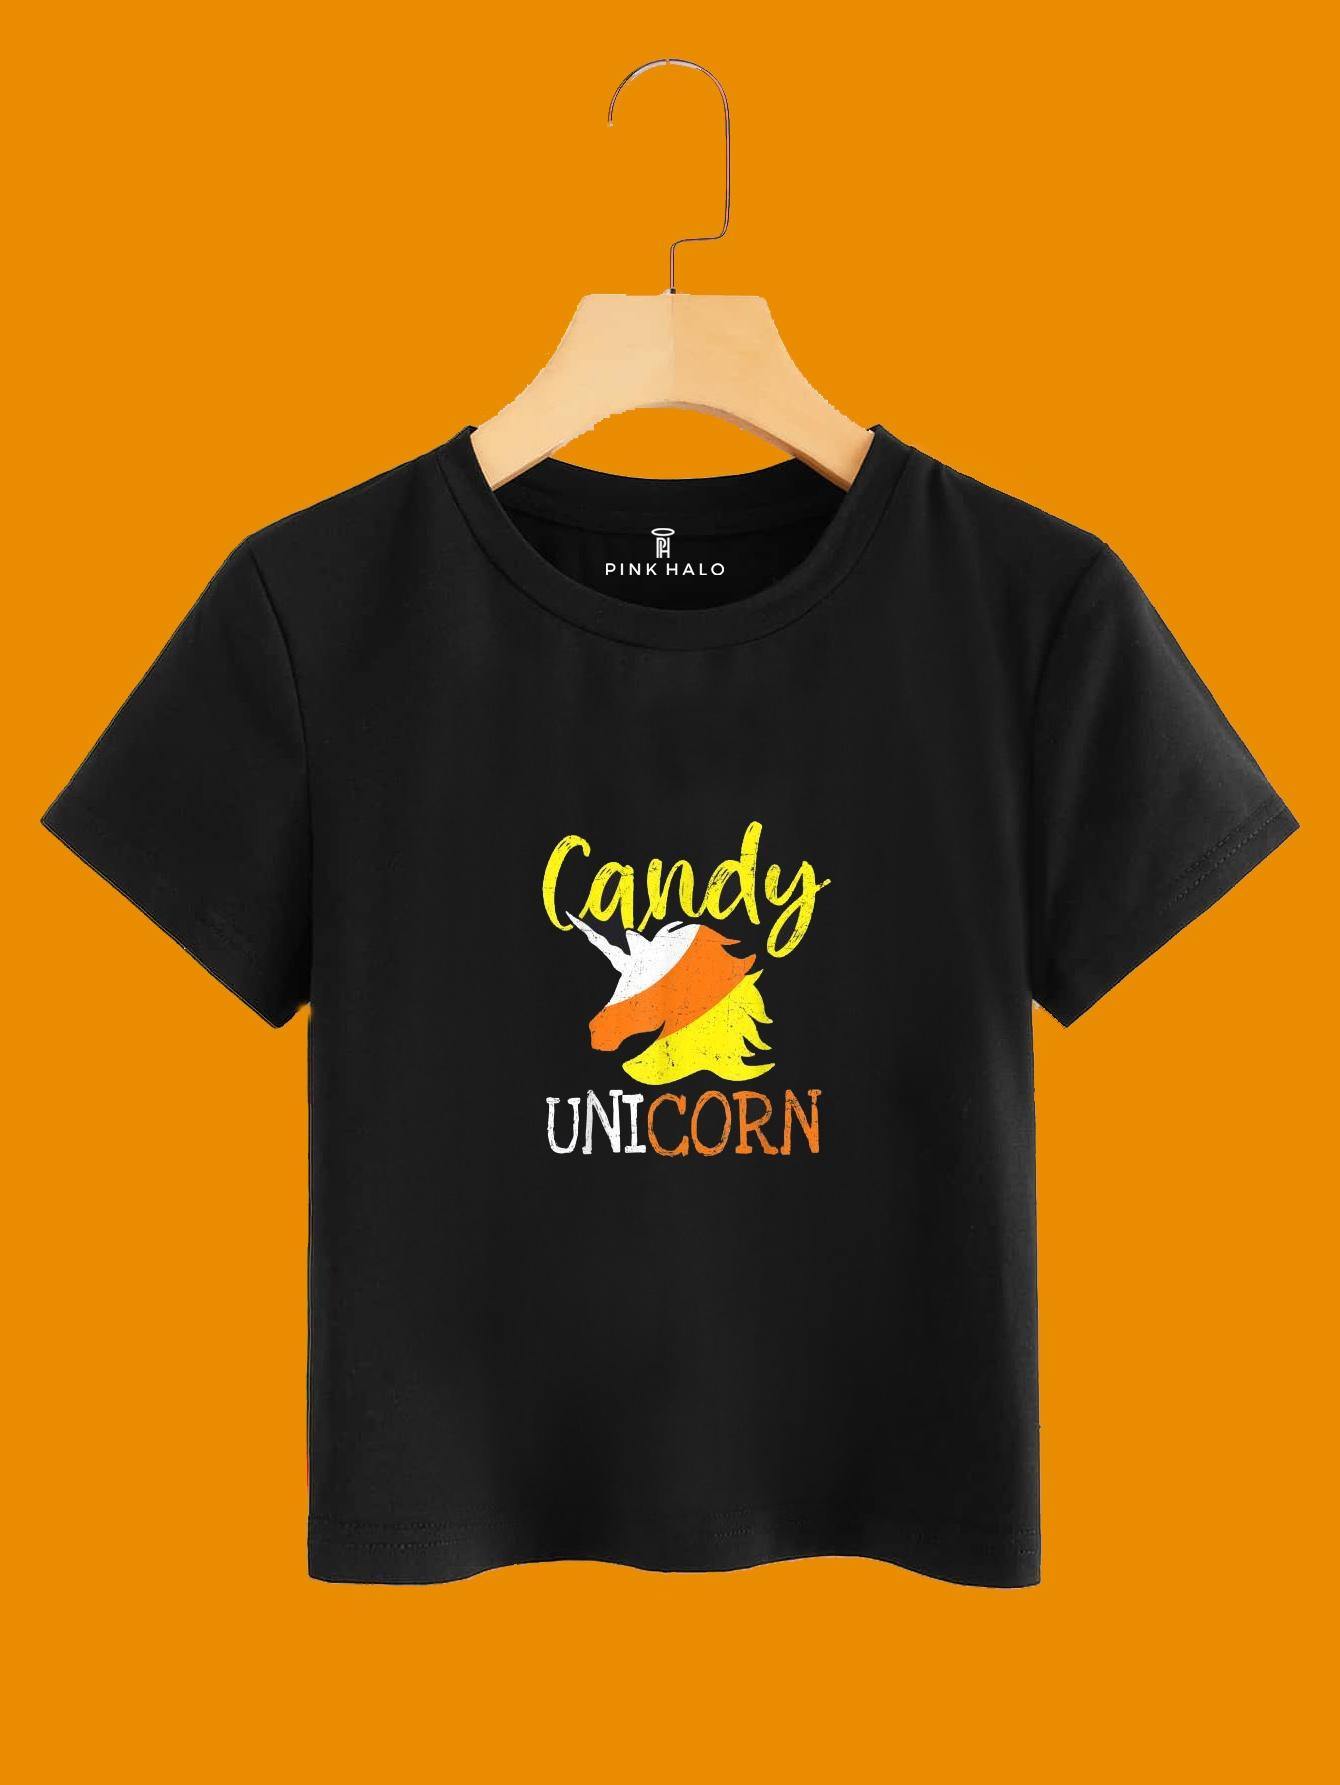 Candy 'Uni' Corn Tee Kind Shop